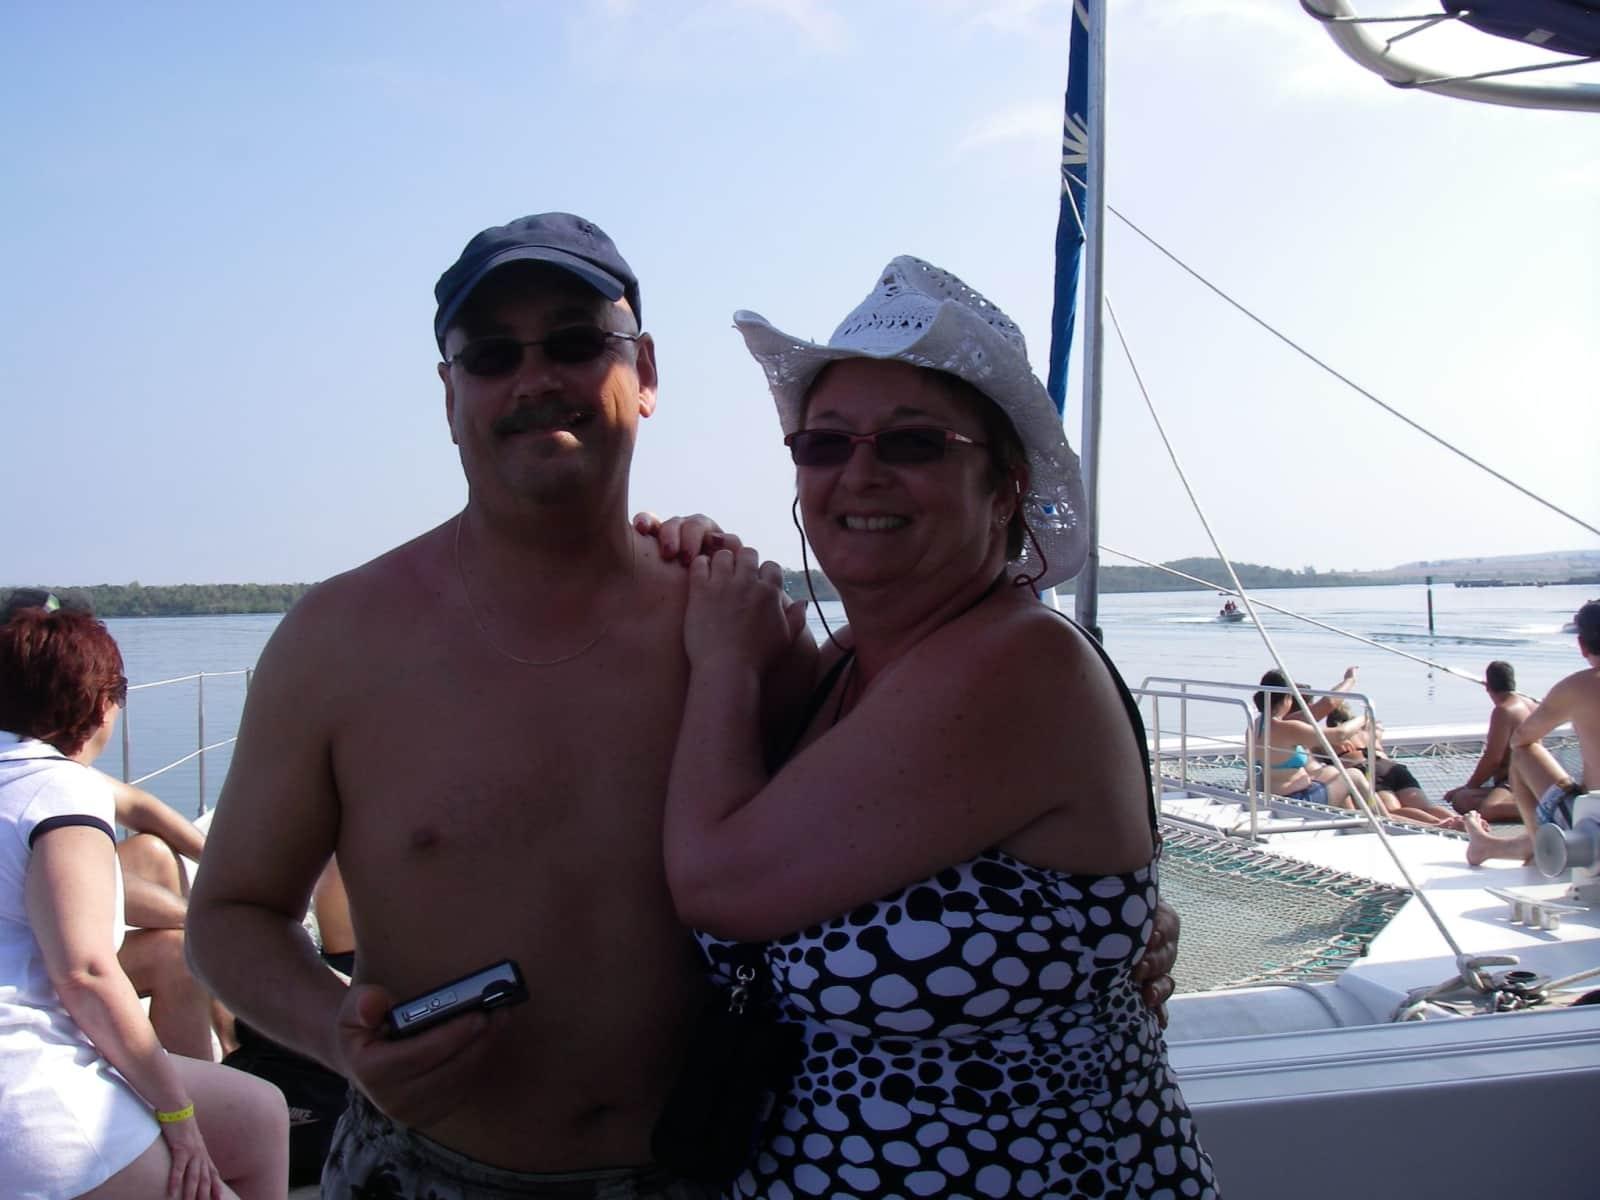 Denise & Wade from Halifax, Nova Scotia, Canada